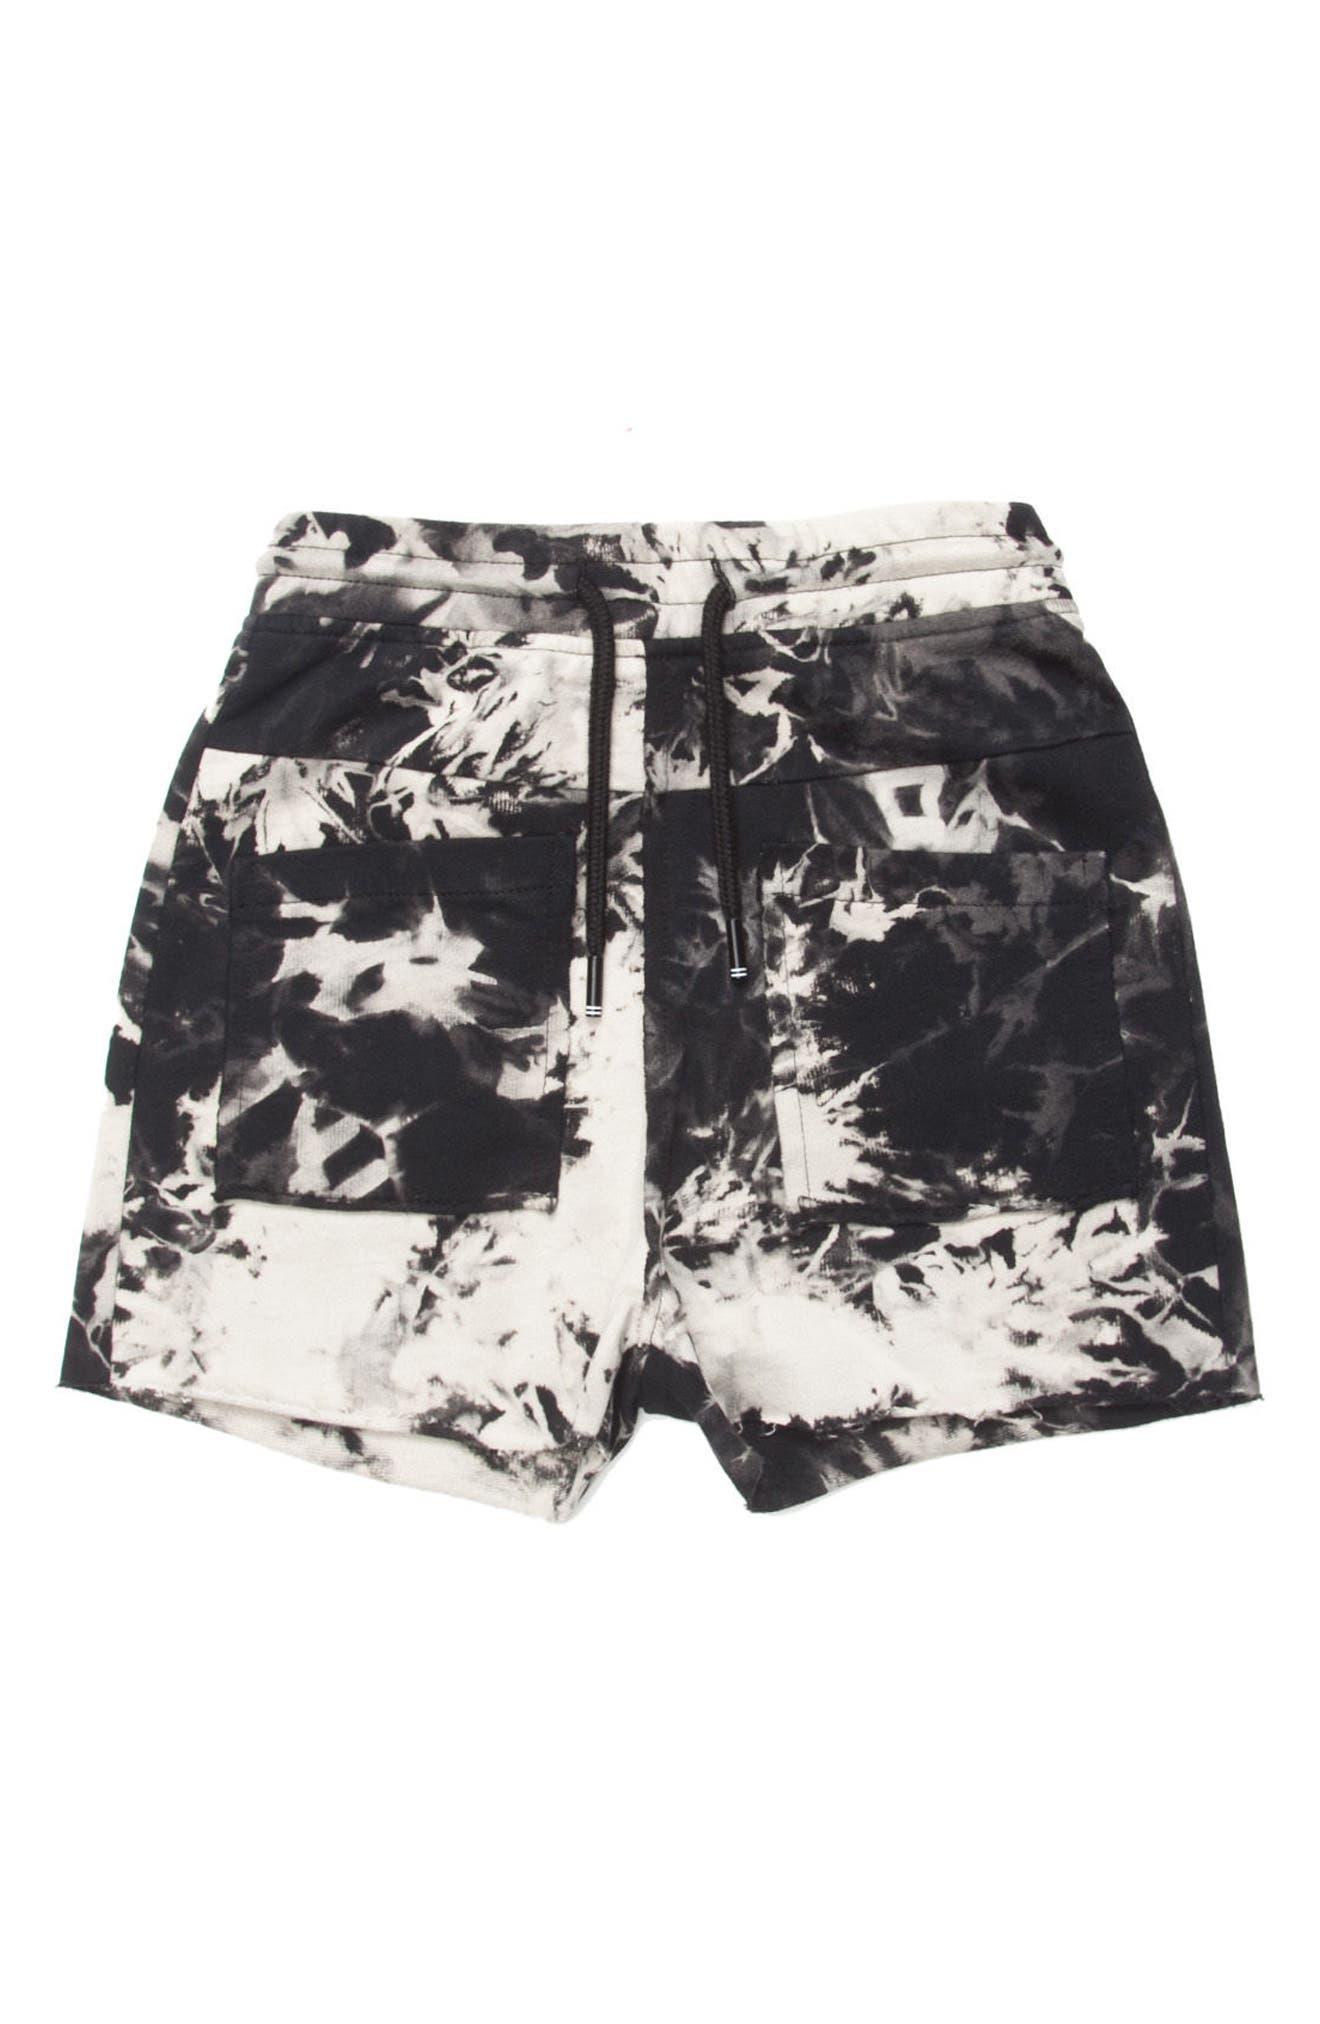 Reese Print Shorts,                             Main thumbnail 1, color,                             Black